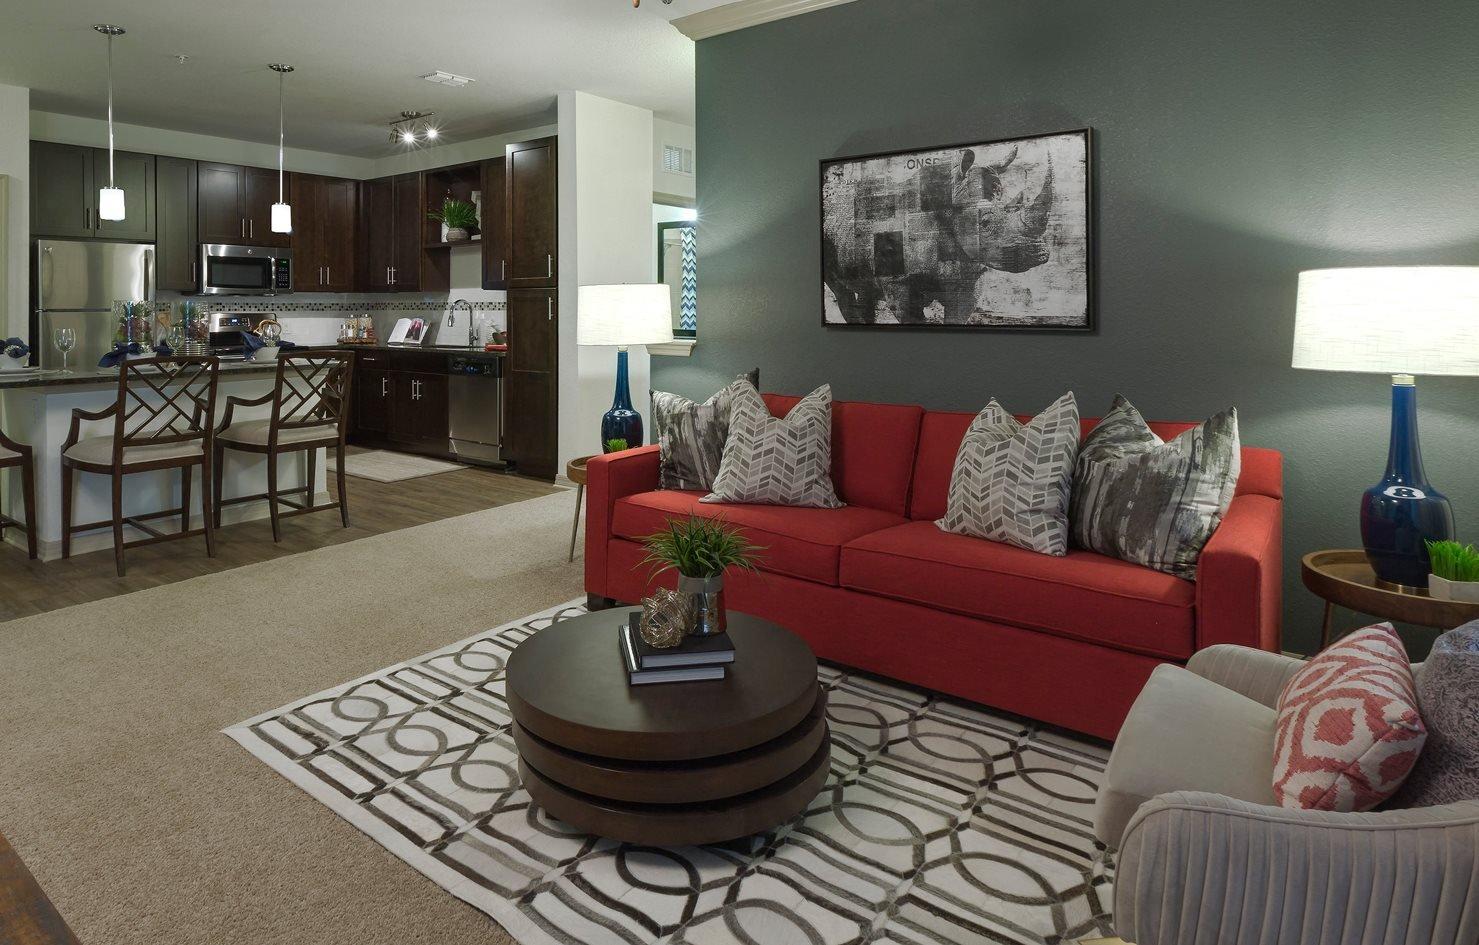 Living Room at Integra 360 Apartments in Winter Springs, FL